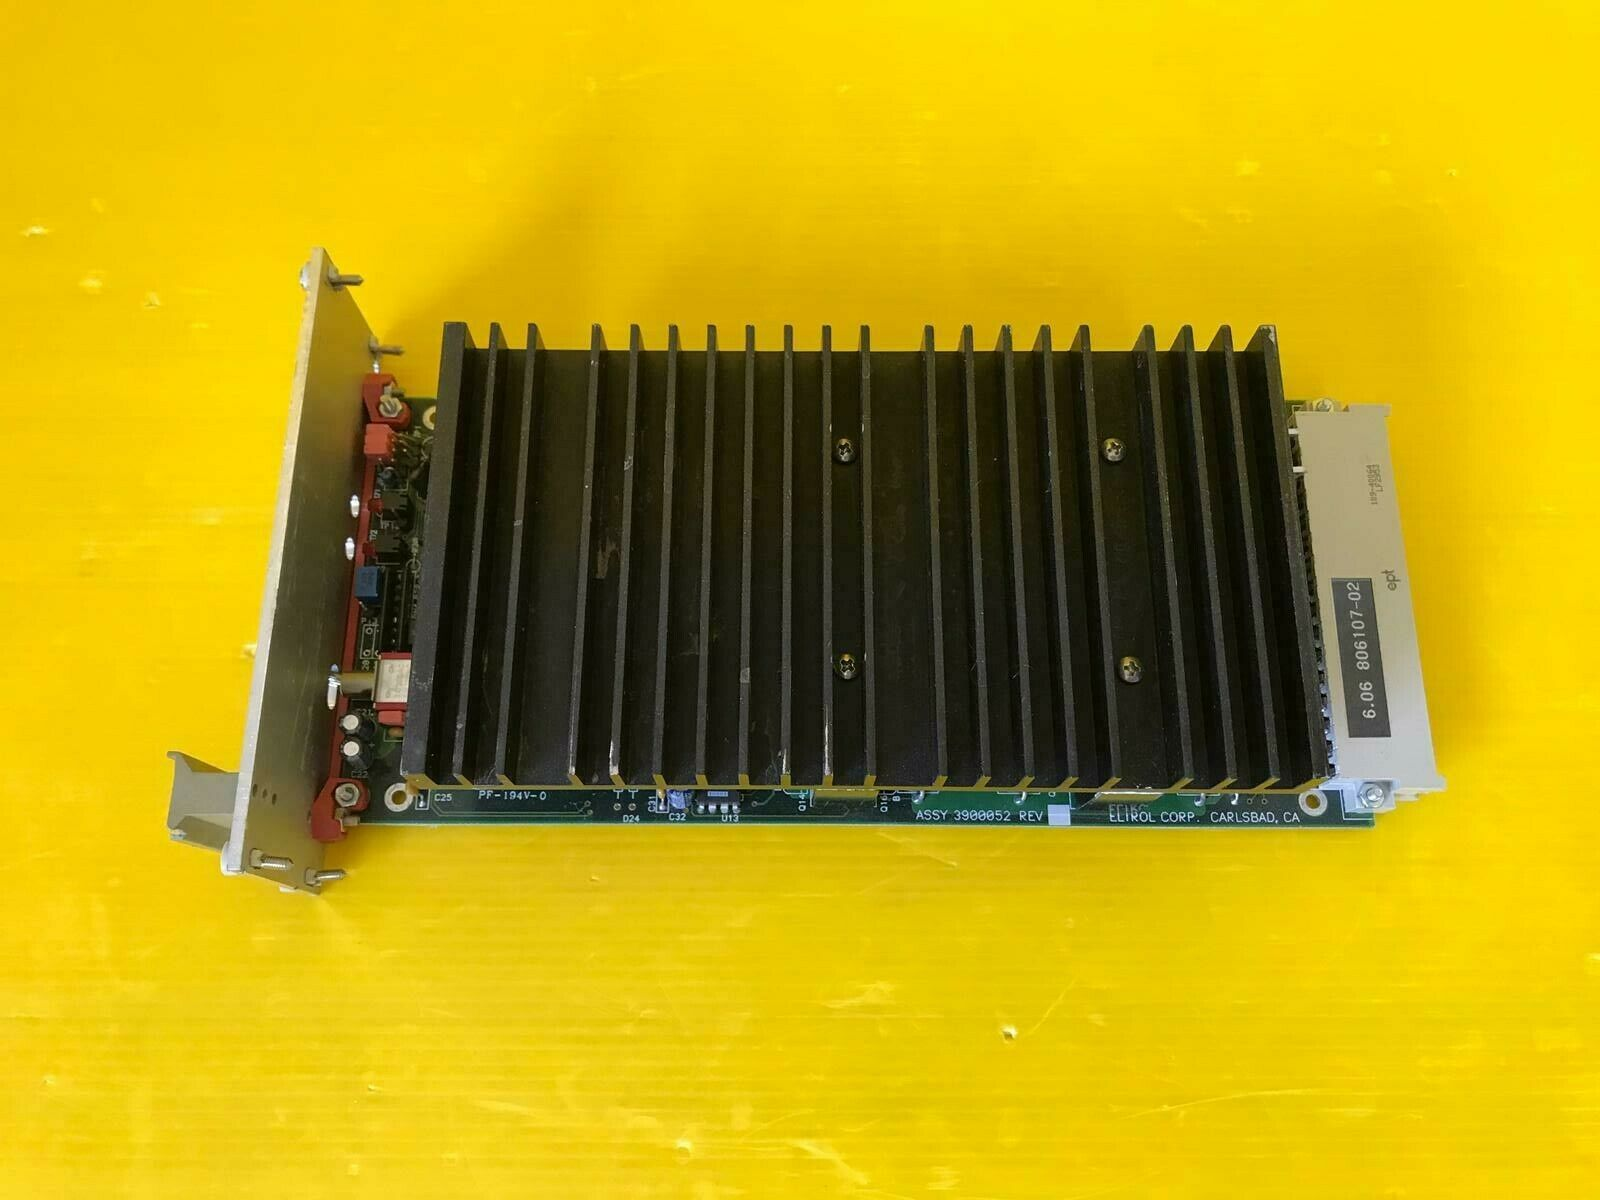 Eltrol amplifier PCB 806107-02 ASSY 3900052